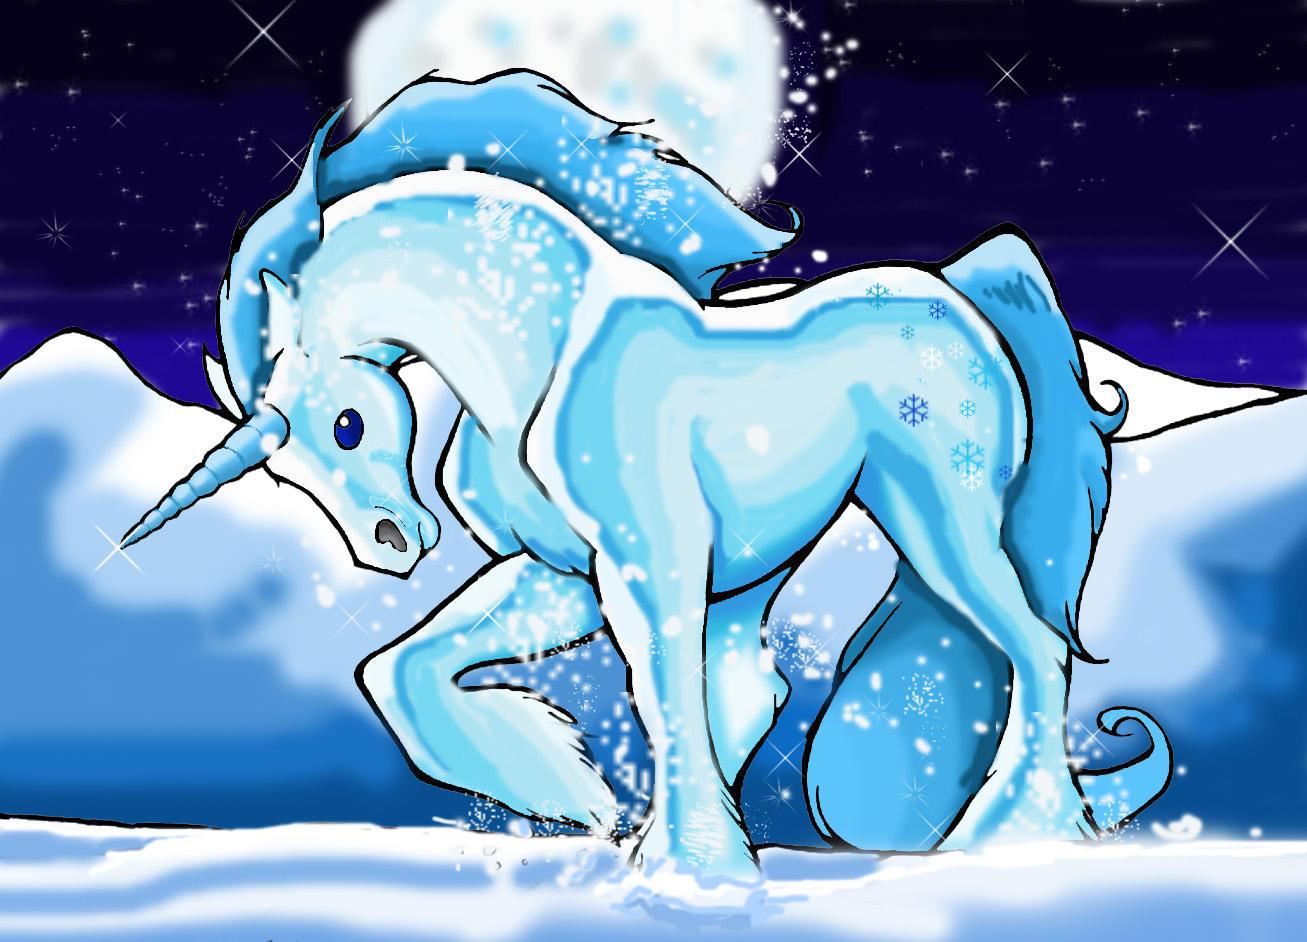 The Ice Unicorn by SonicMaster23 on DeviantArt